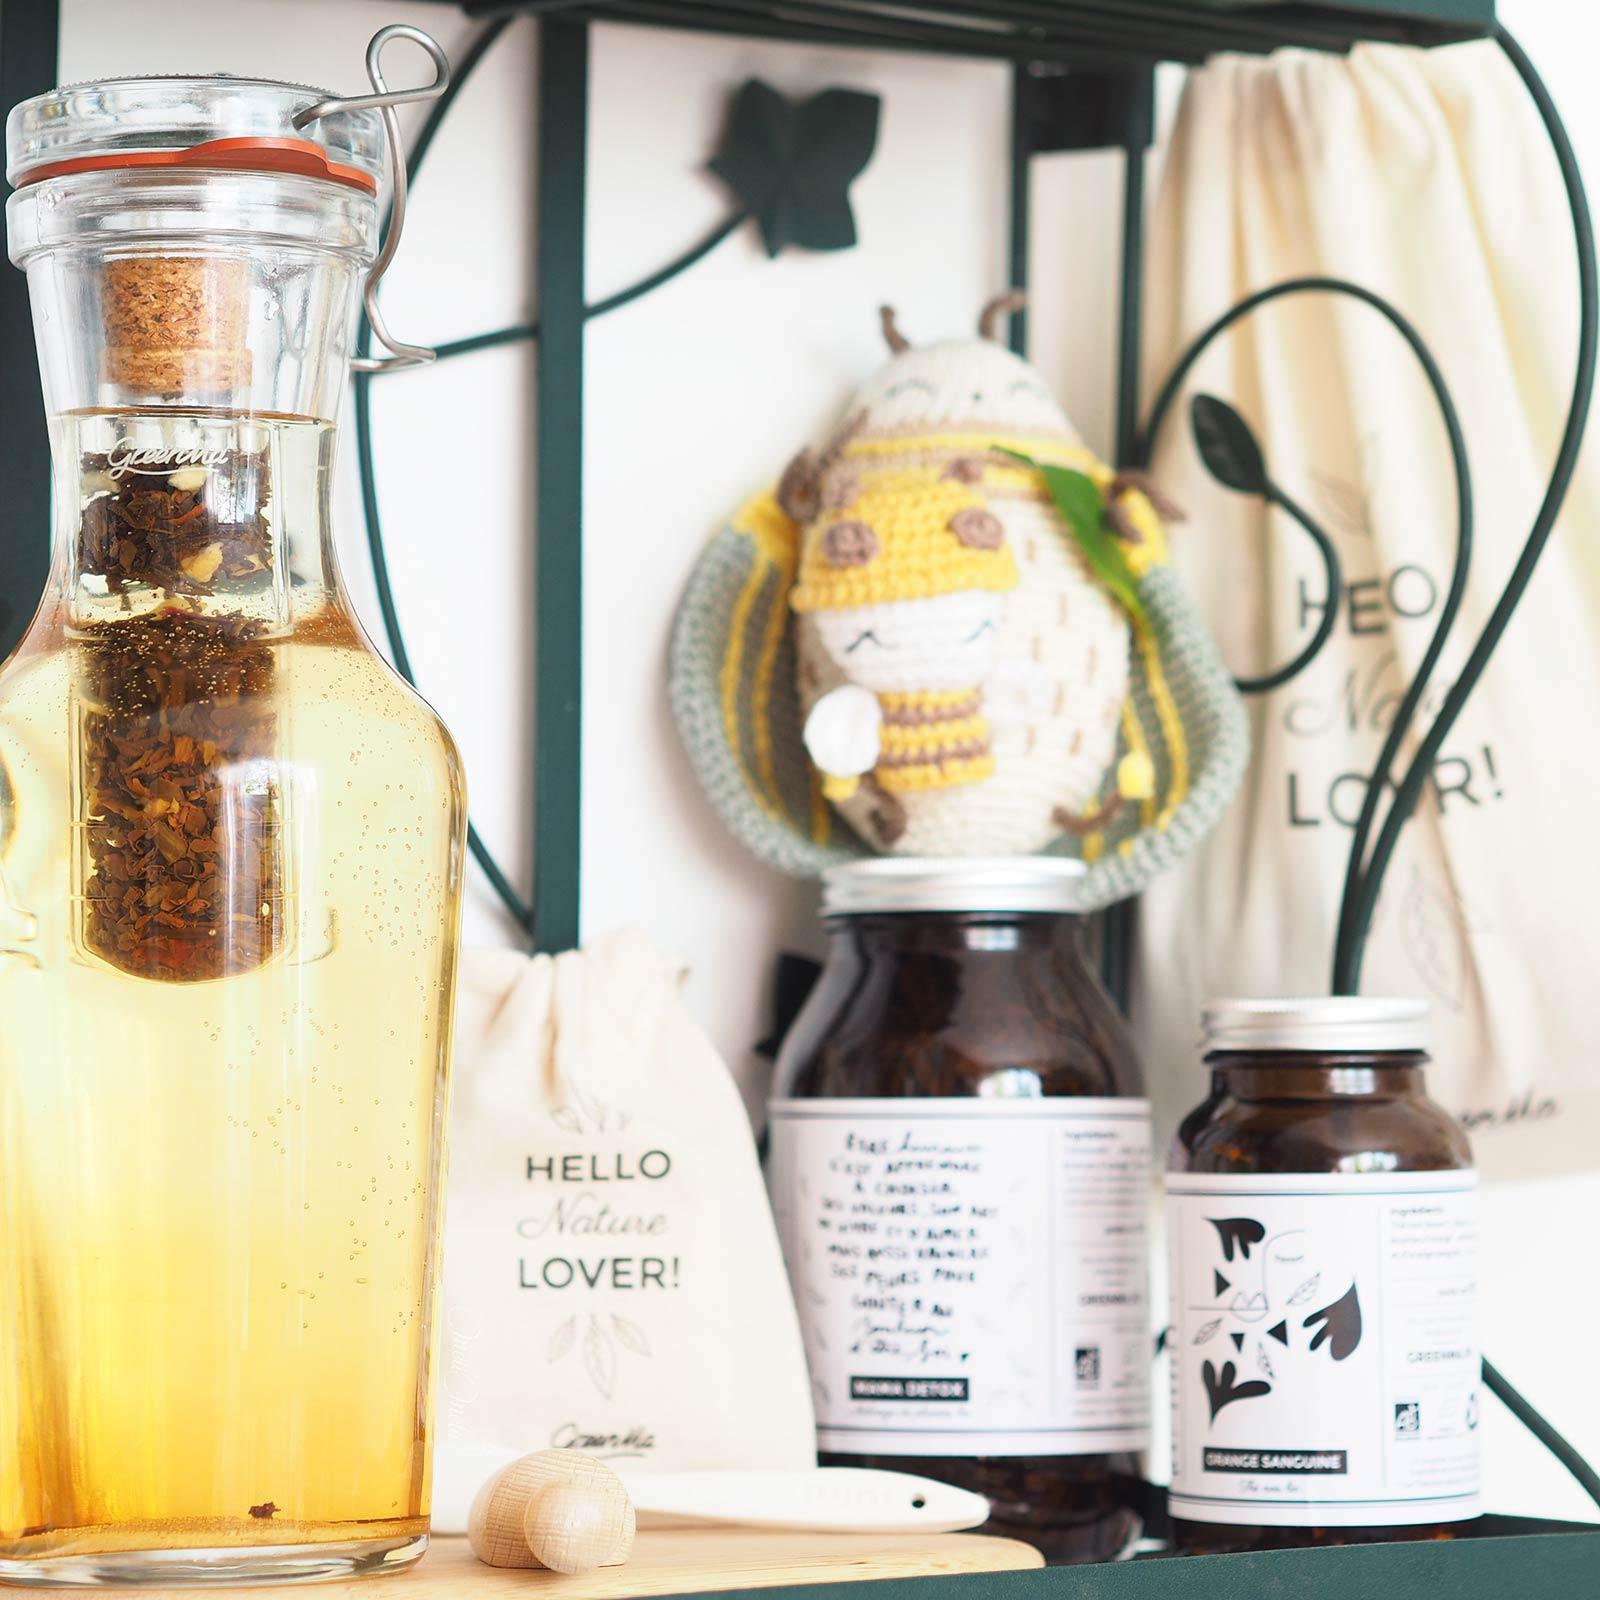 infusion-a-froid-the-noir-bio-orange-sanguine-greenma-france